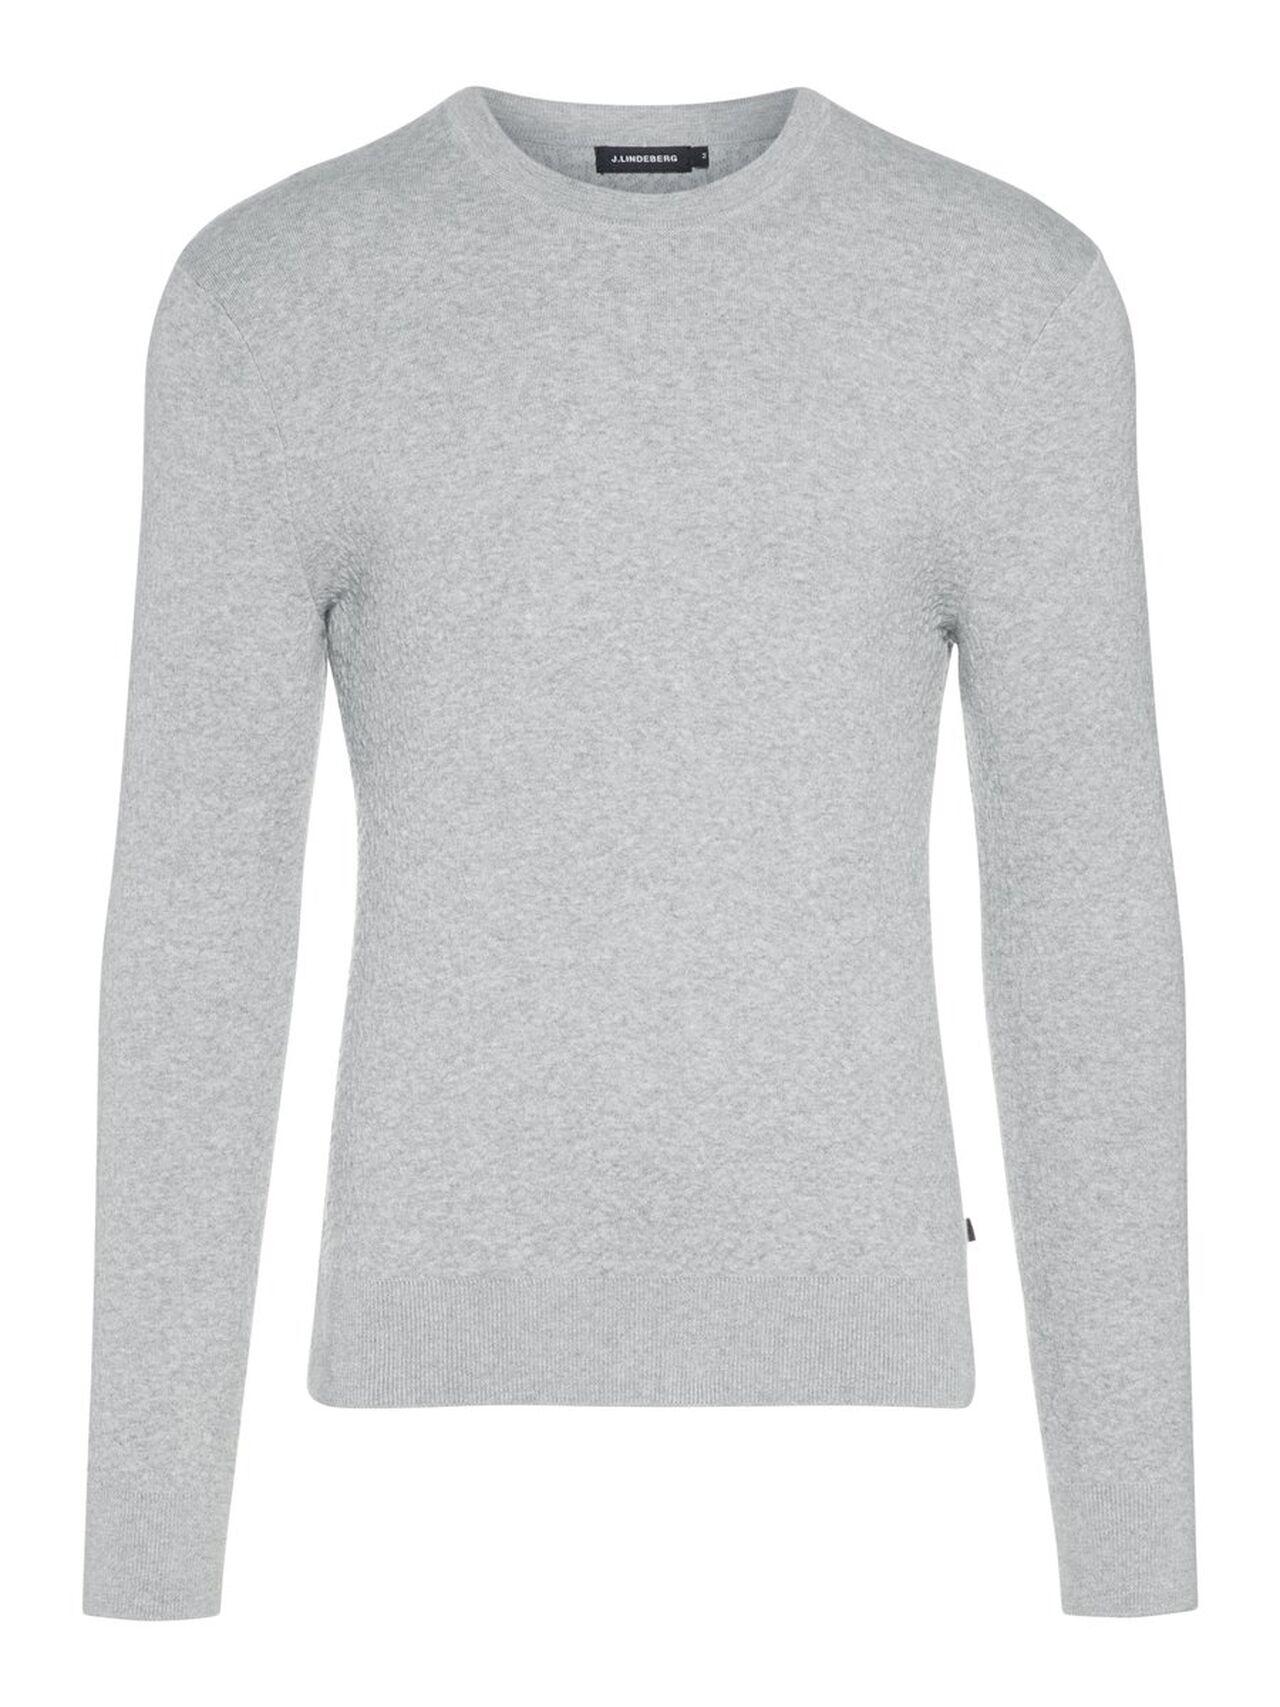 J.LINDEBERG Taylon Micro Crinkled Knit Sweater Man Grå